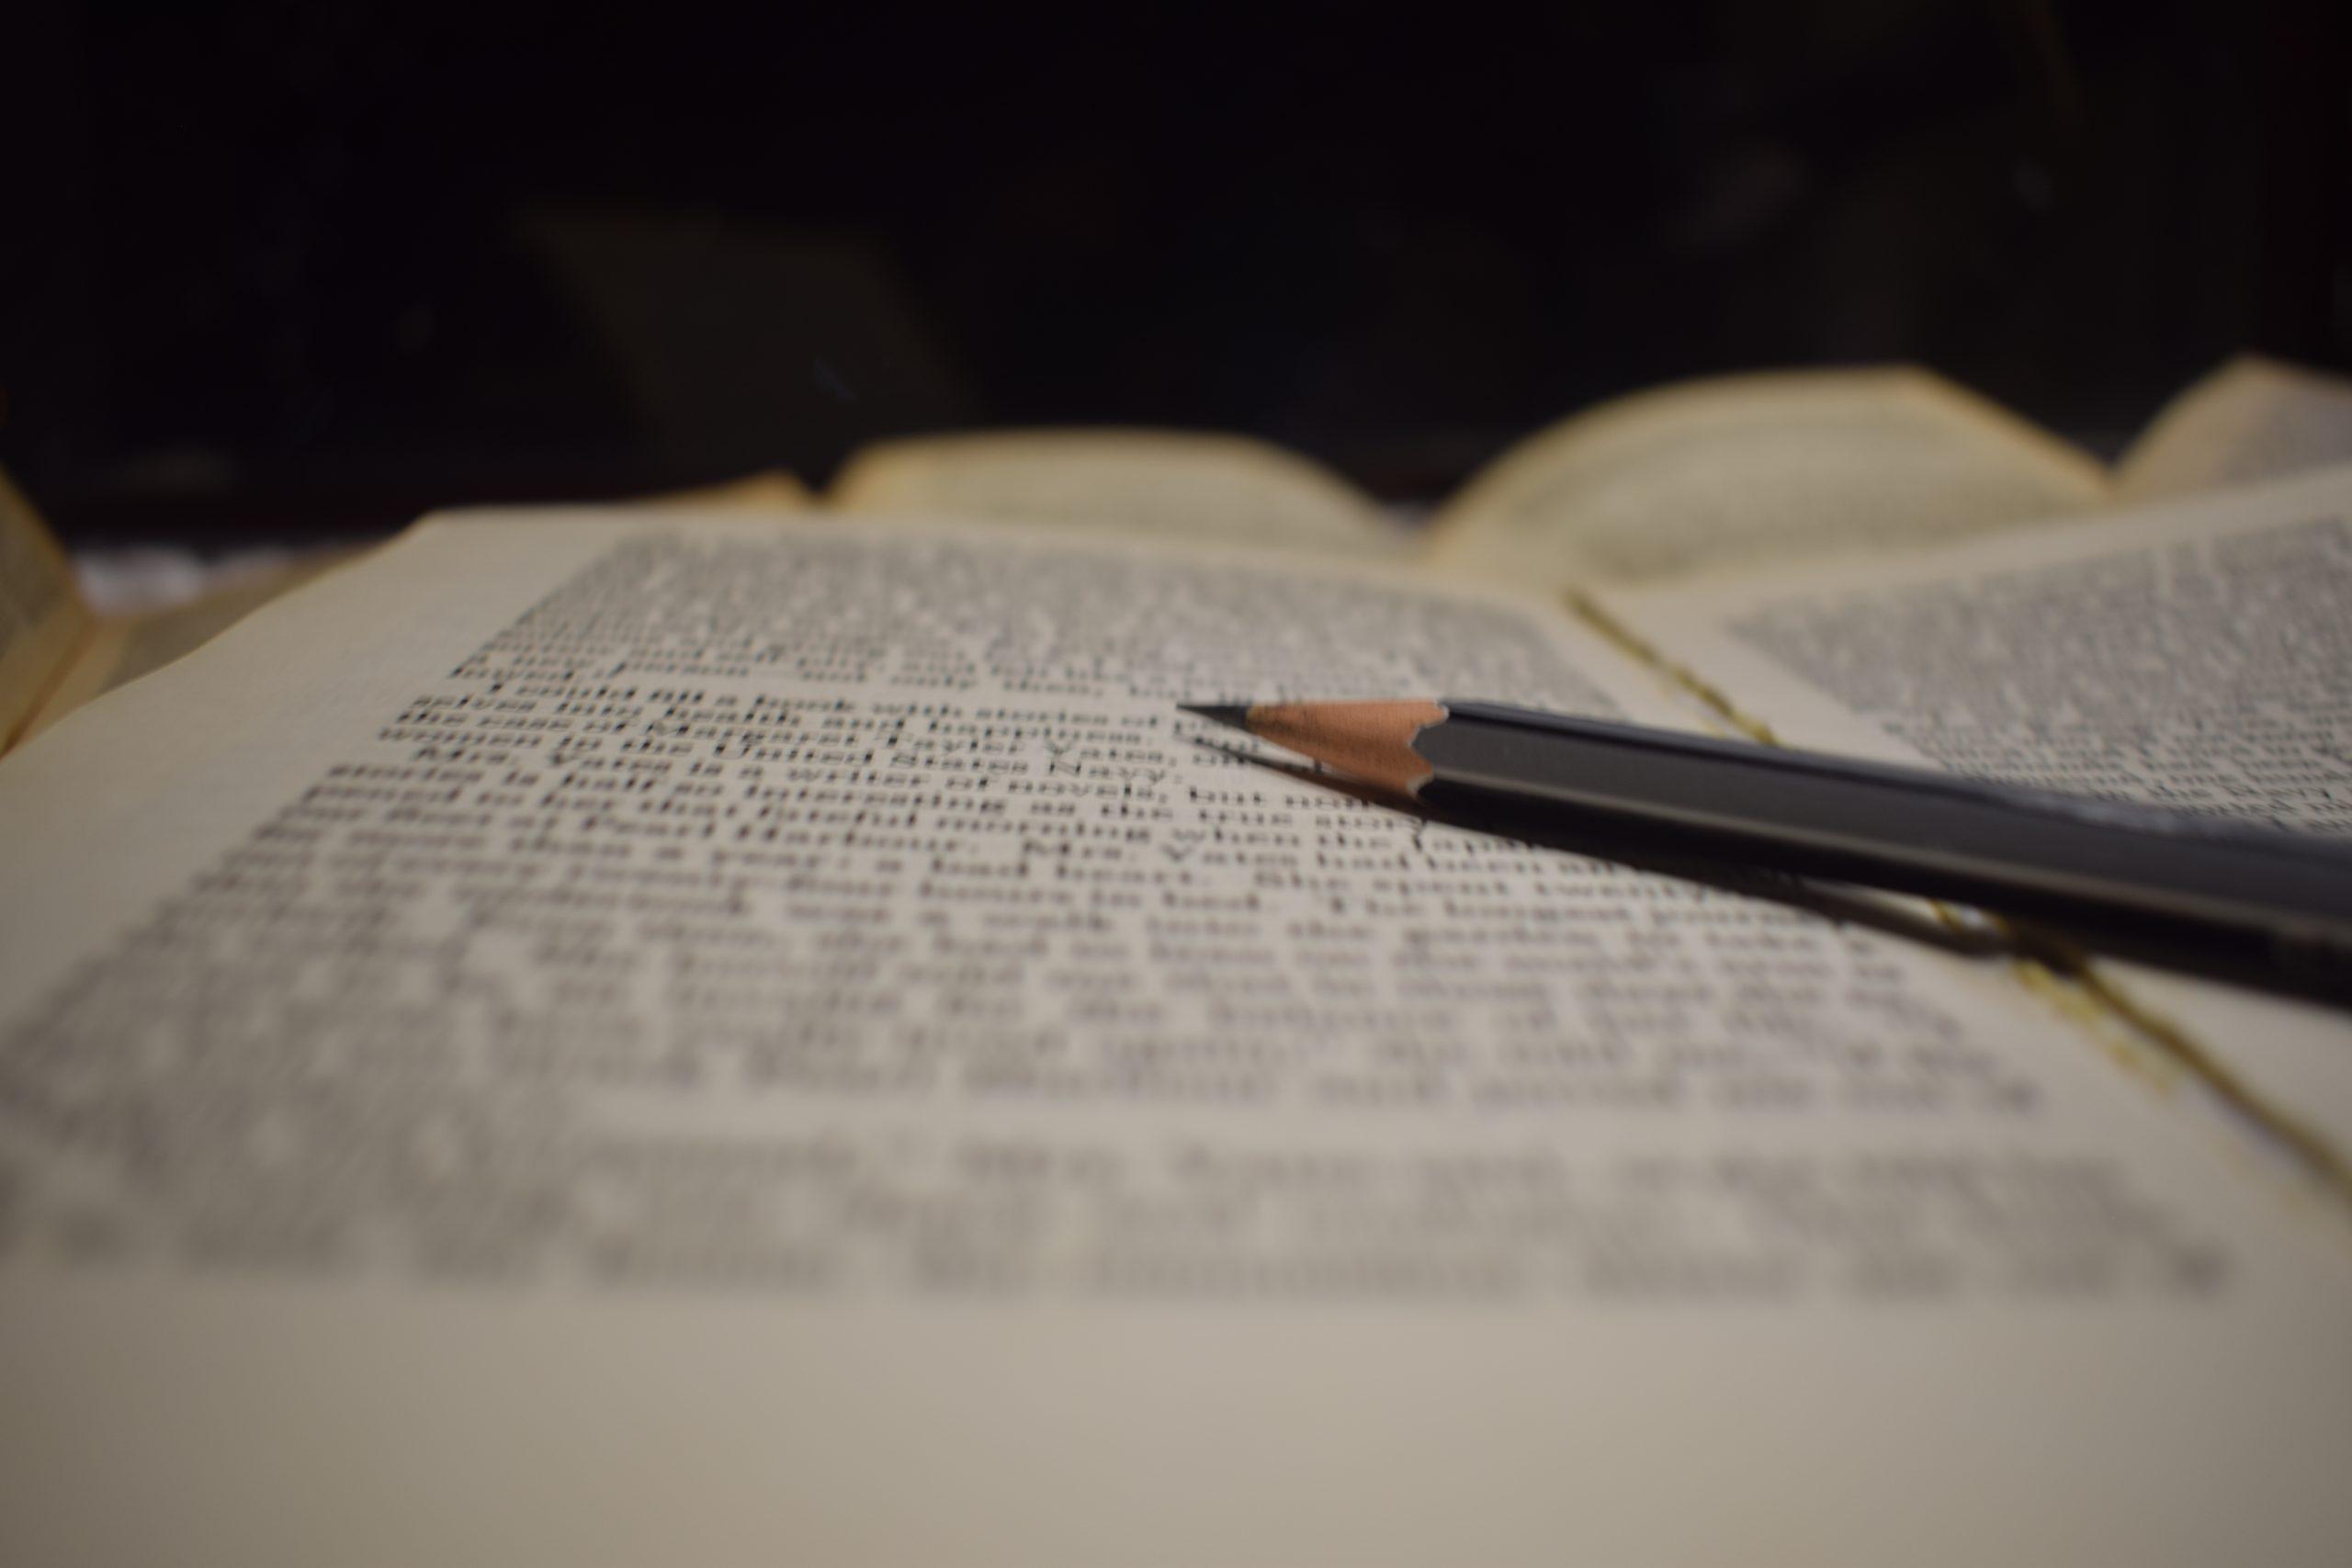 A pencil on a book